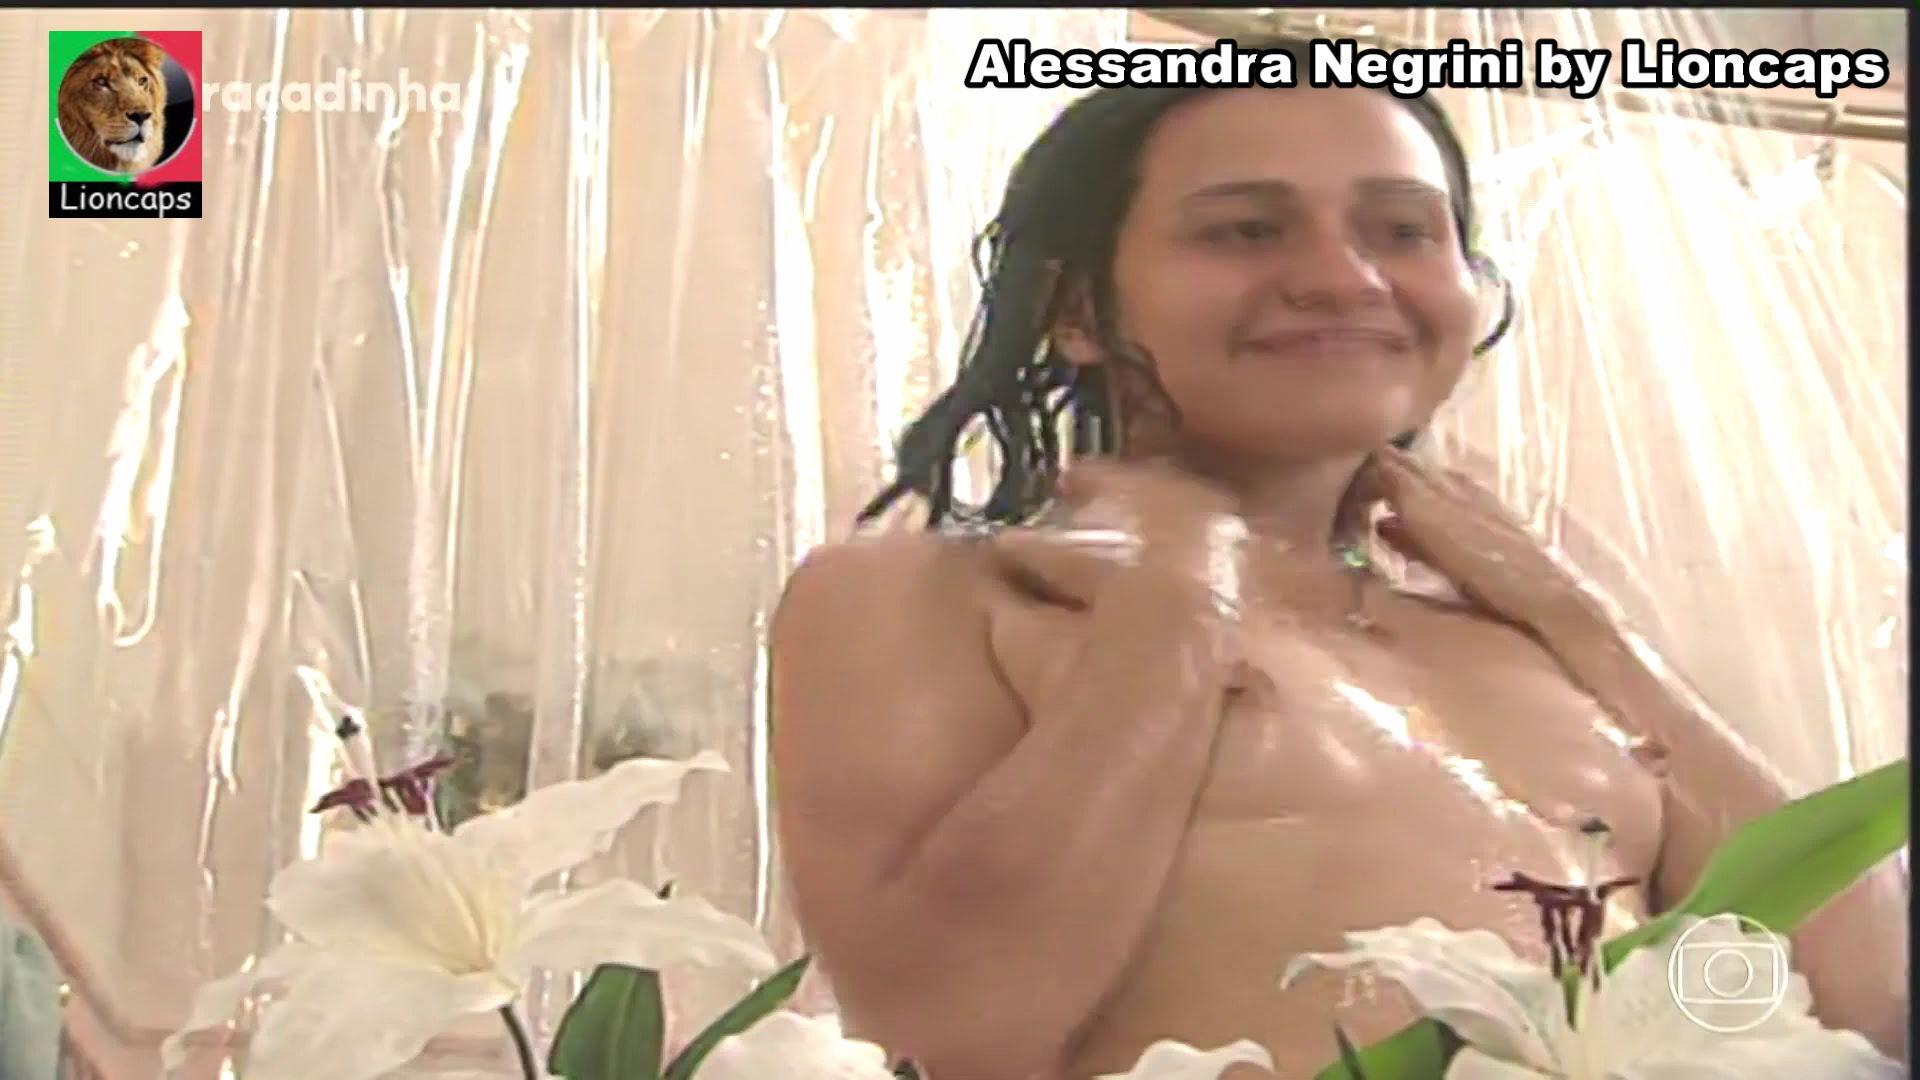 alessandra_negrini_vs200503-068 (12).JPG